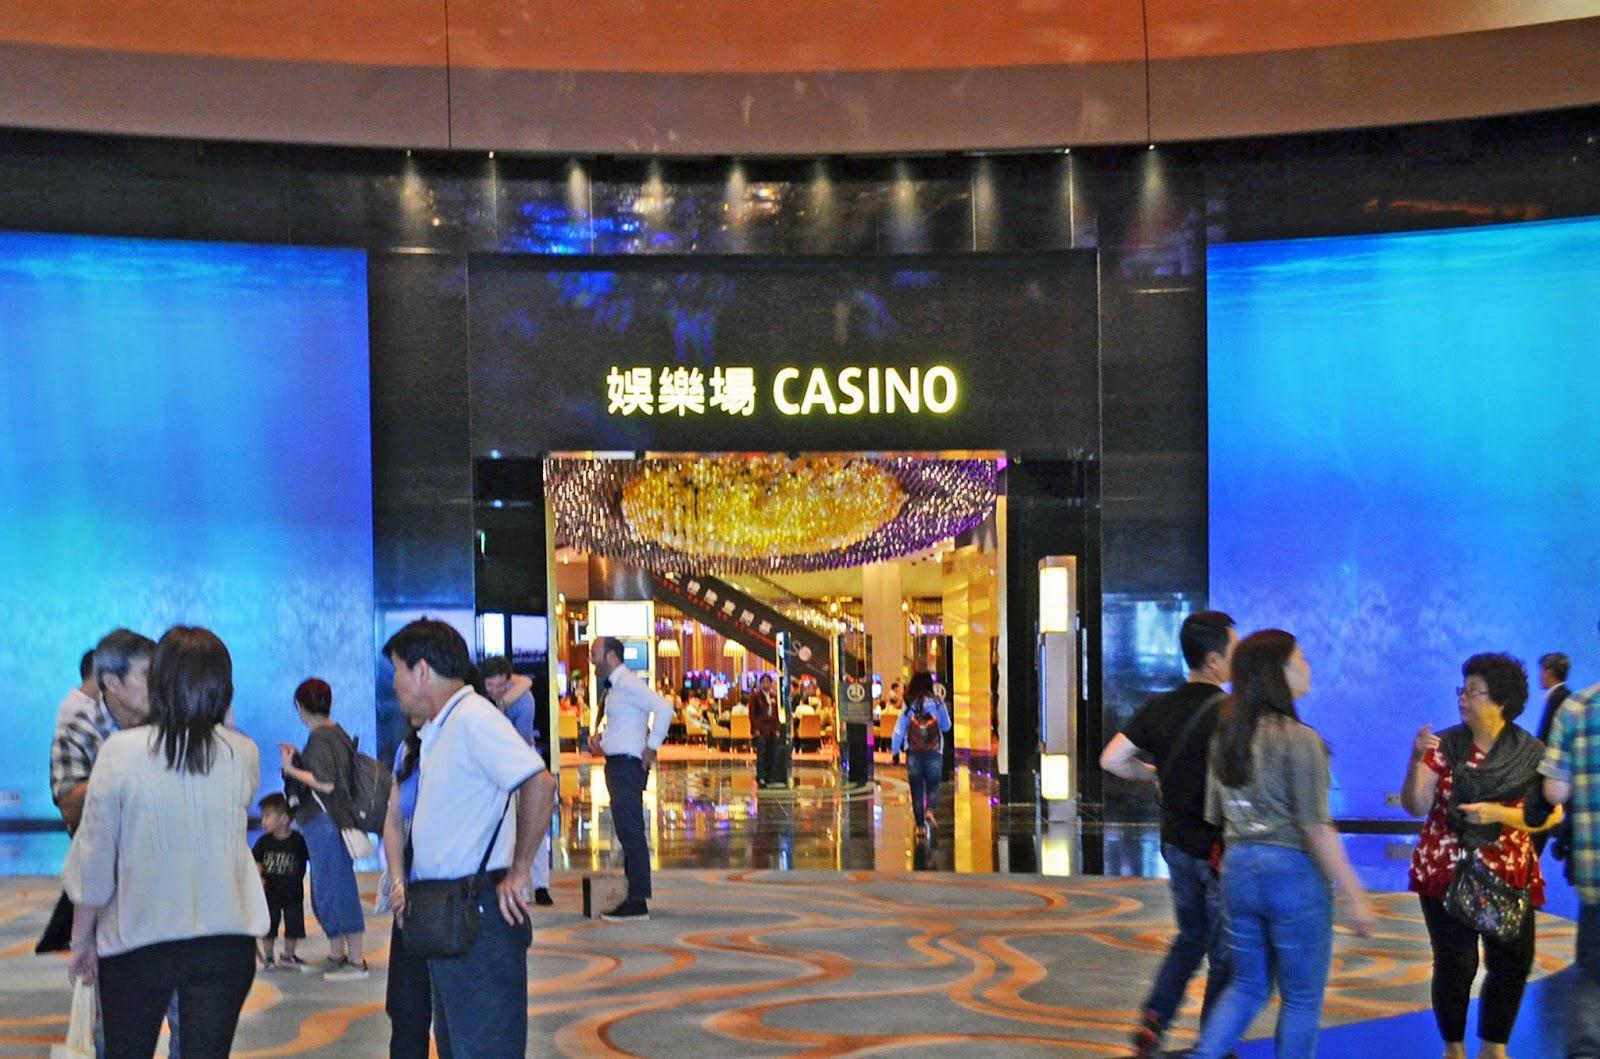 Macau casino blog tips on gambling